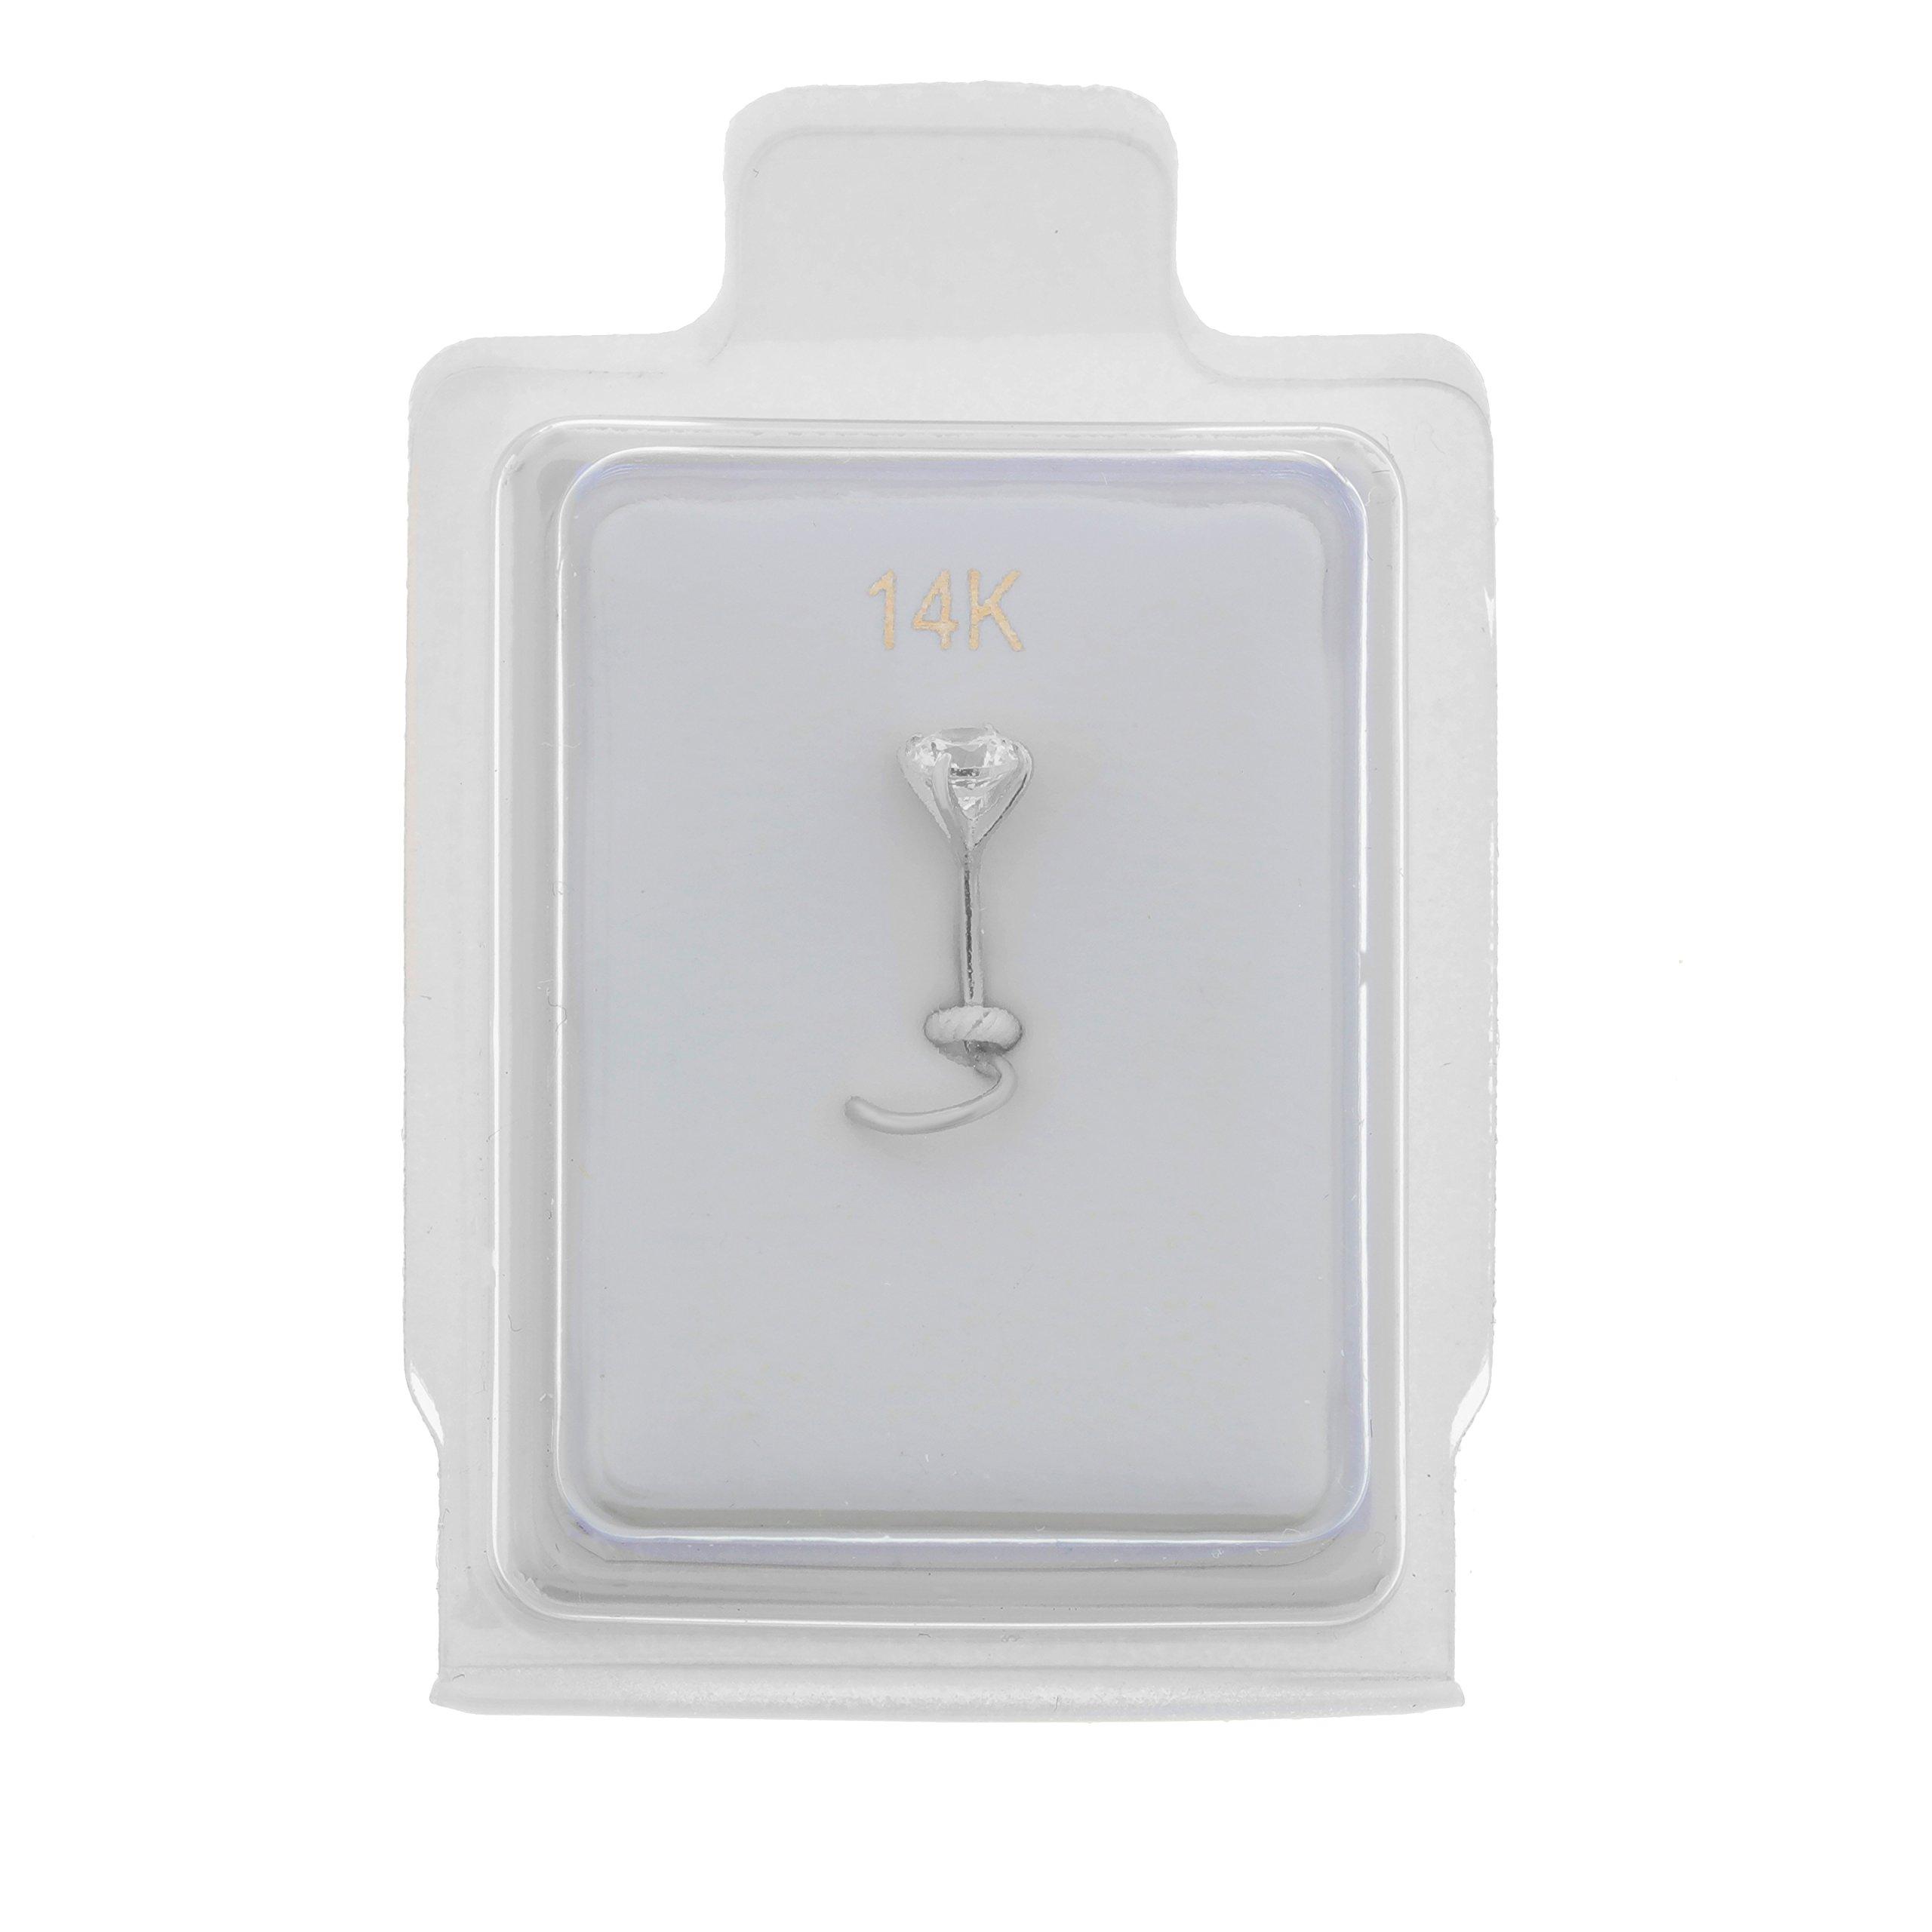 14K White Gold 2mm White Cubic Zirconium Nose Ring Curve Stud Twist Screw 22G